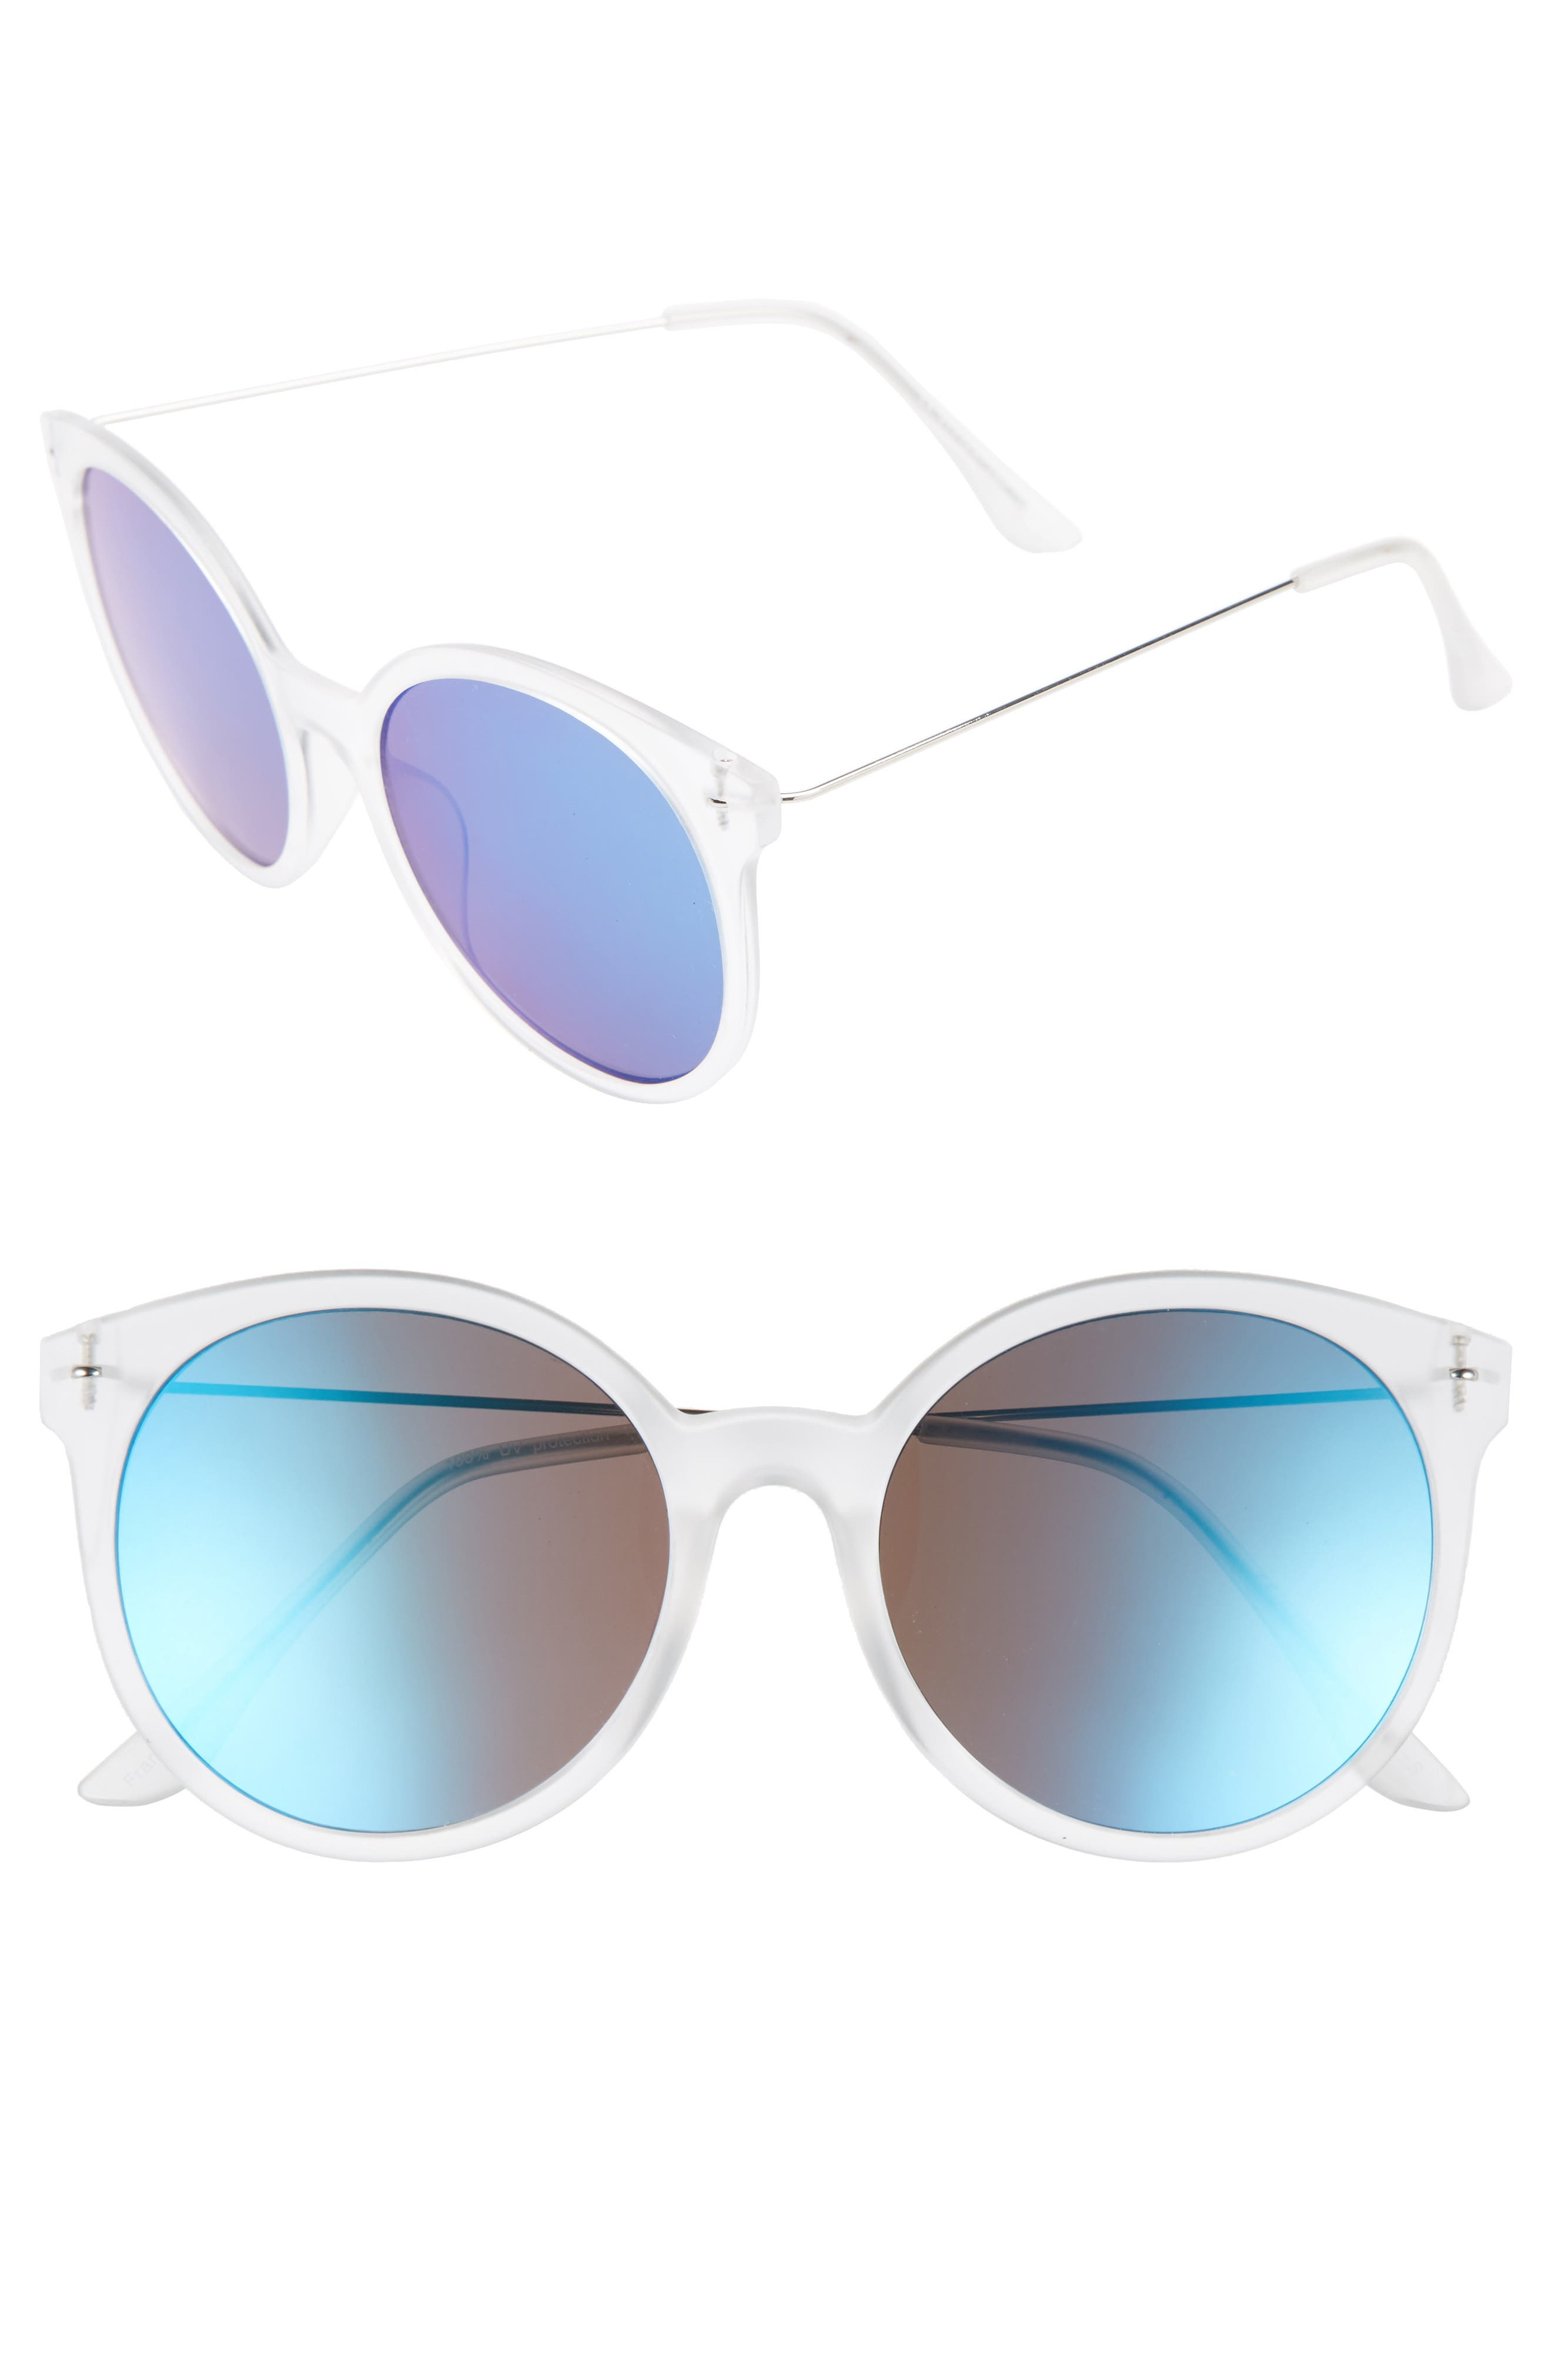 GLANCE EYEWEAR,                             62mm Transparent Round Lens Sunglasses,                             Main thumbnail 1, color,                             100